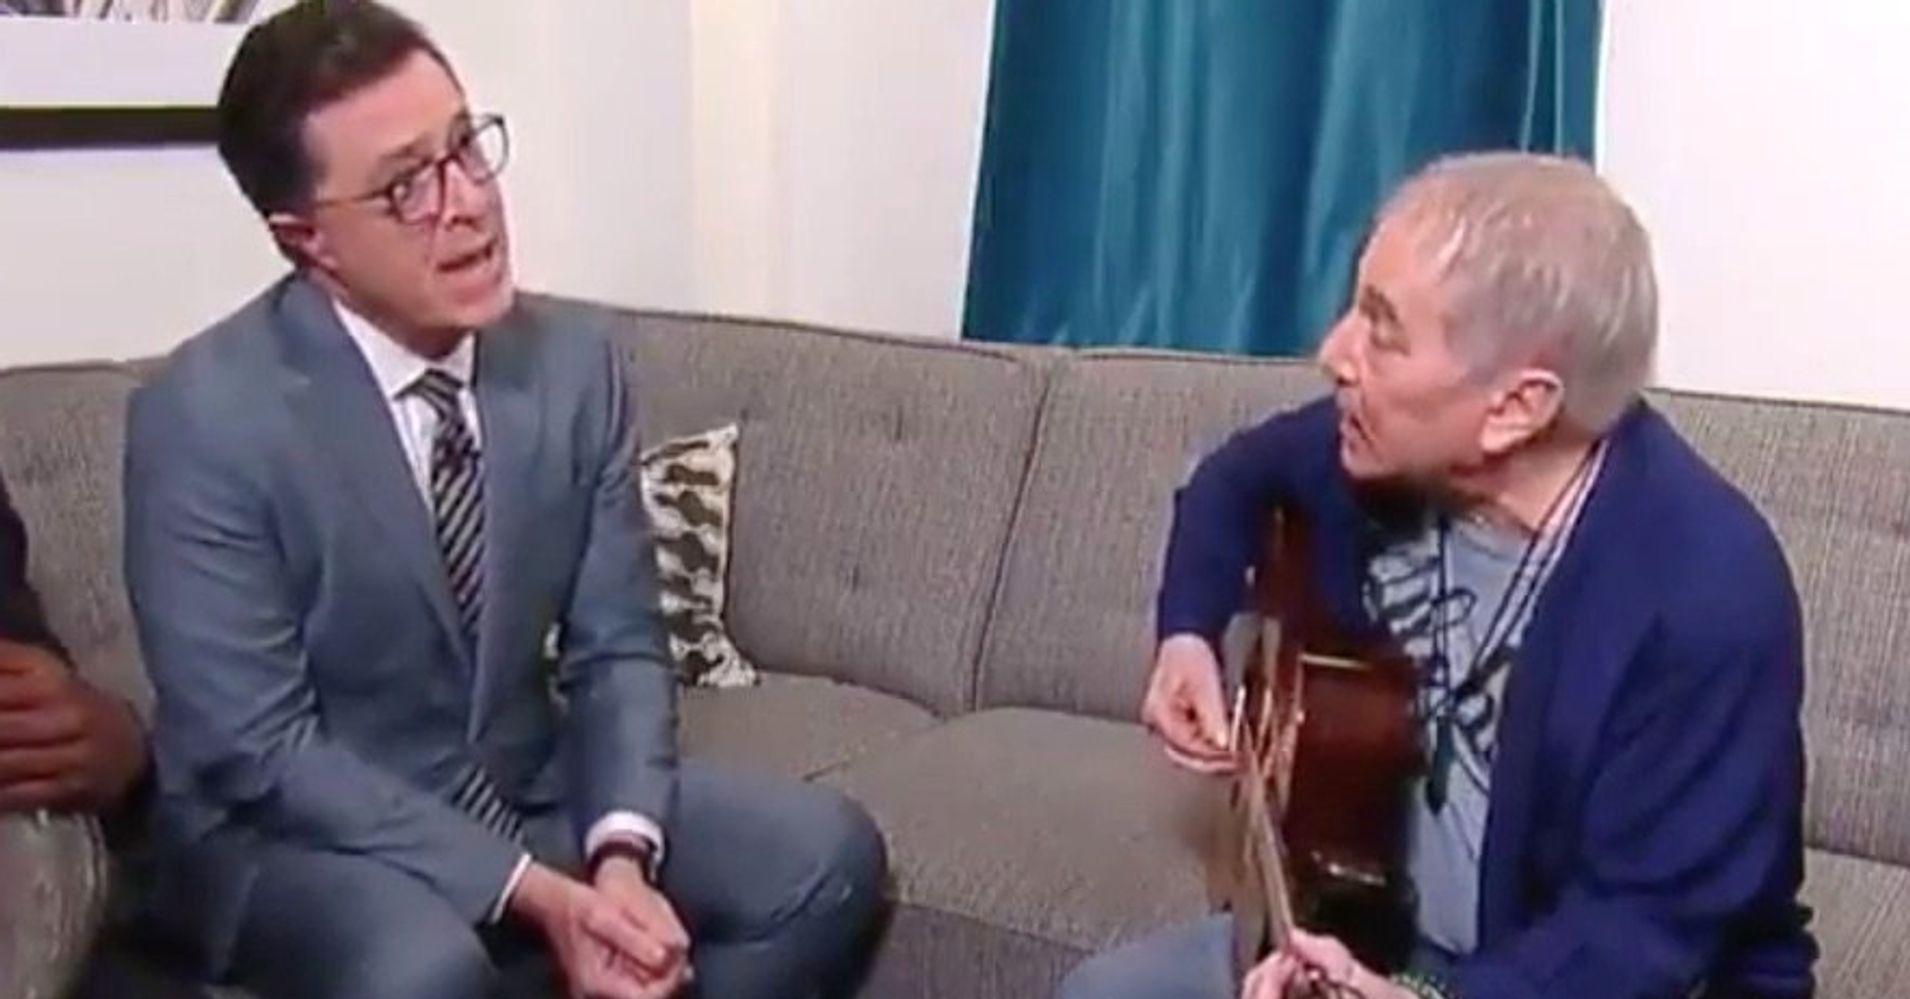 Paul Simon & Stephen Colbert Give Classic Song A Hilarious Trump-Era Update - HuffPost